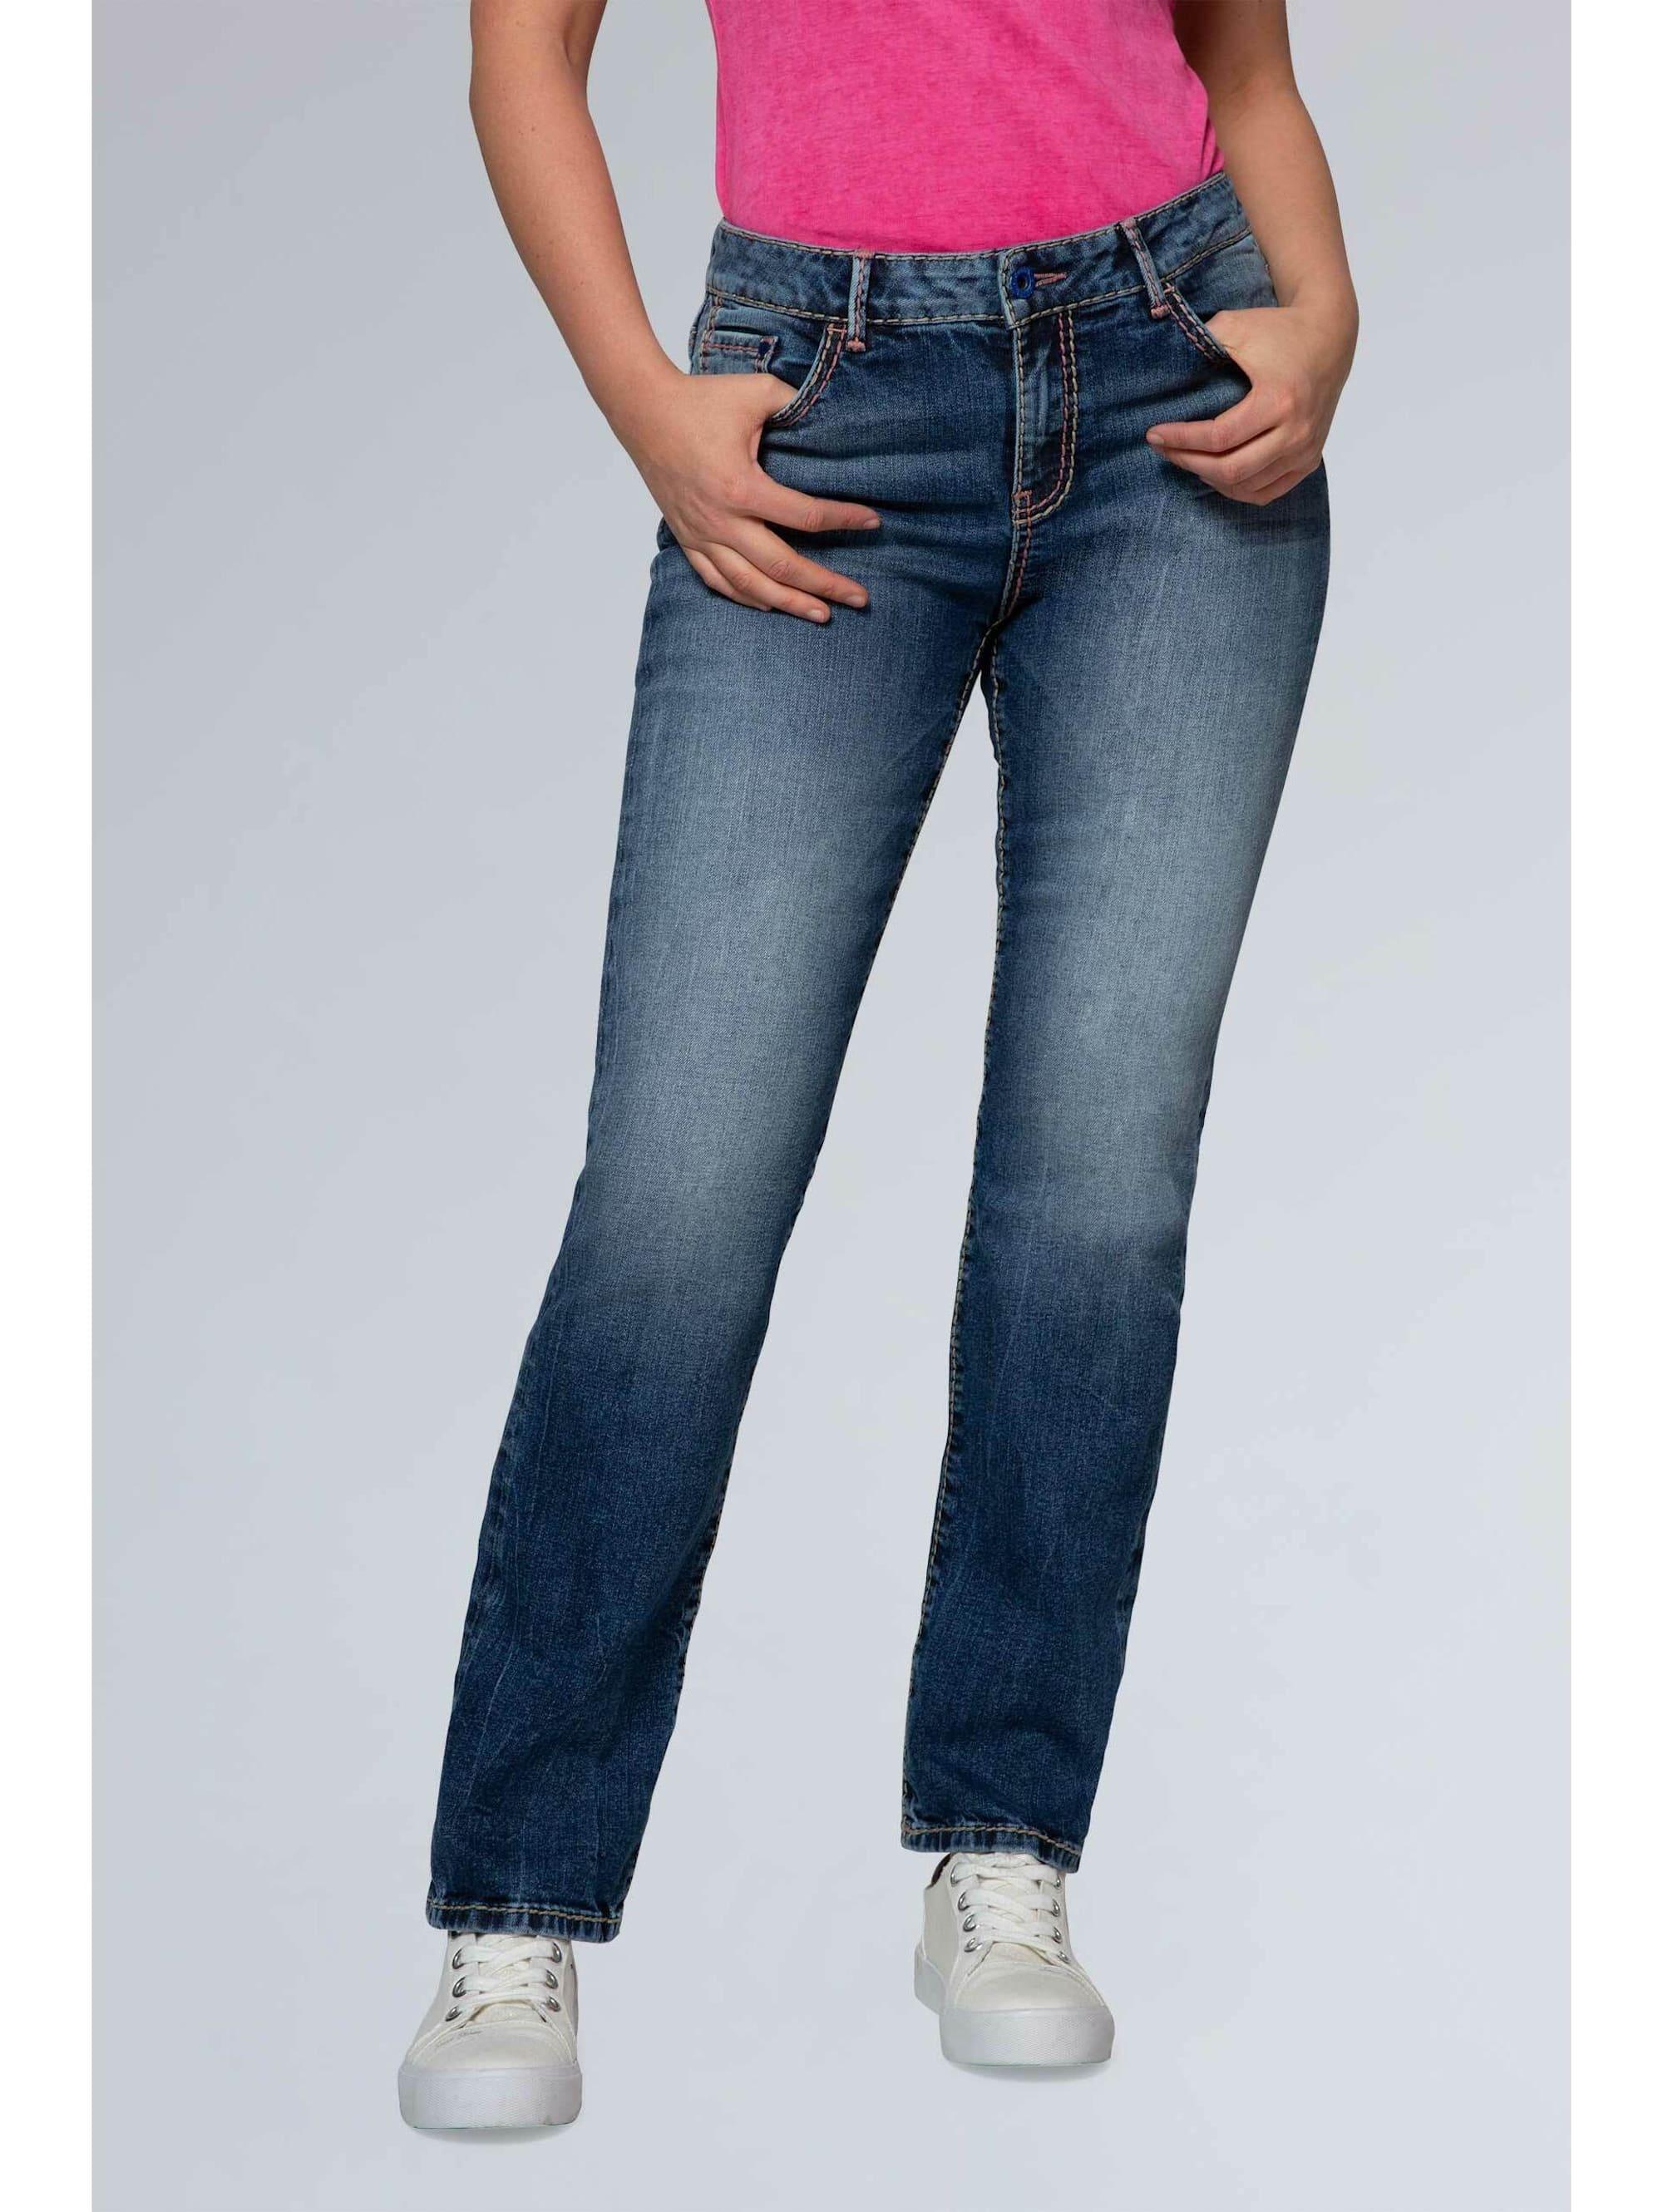 SOCCX Comfort Shape Jeans EL:KE im Stone Used Look WzfAD KsZqH